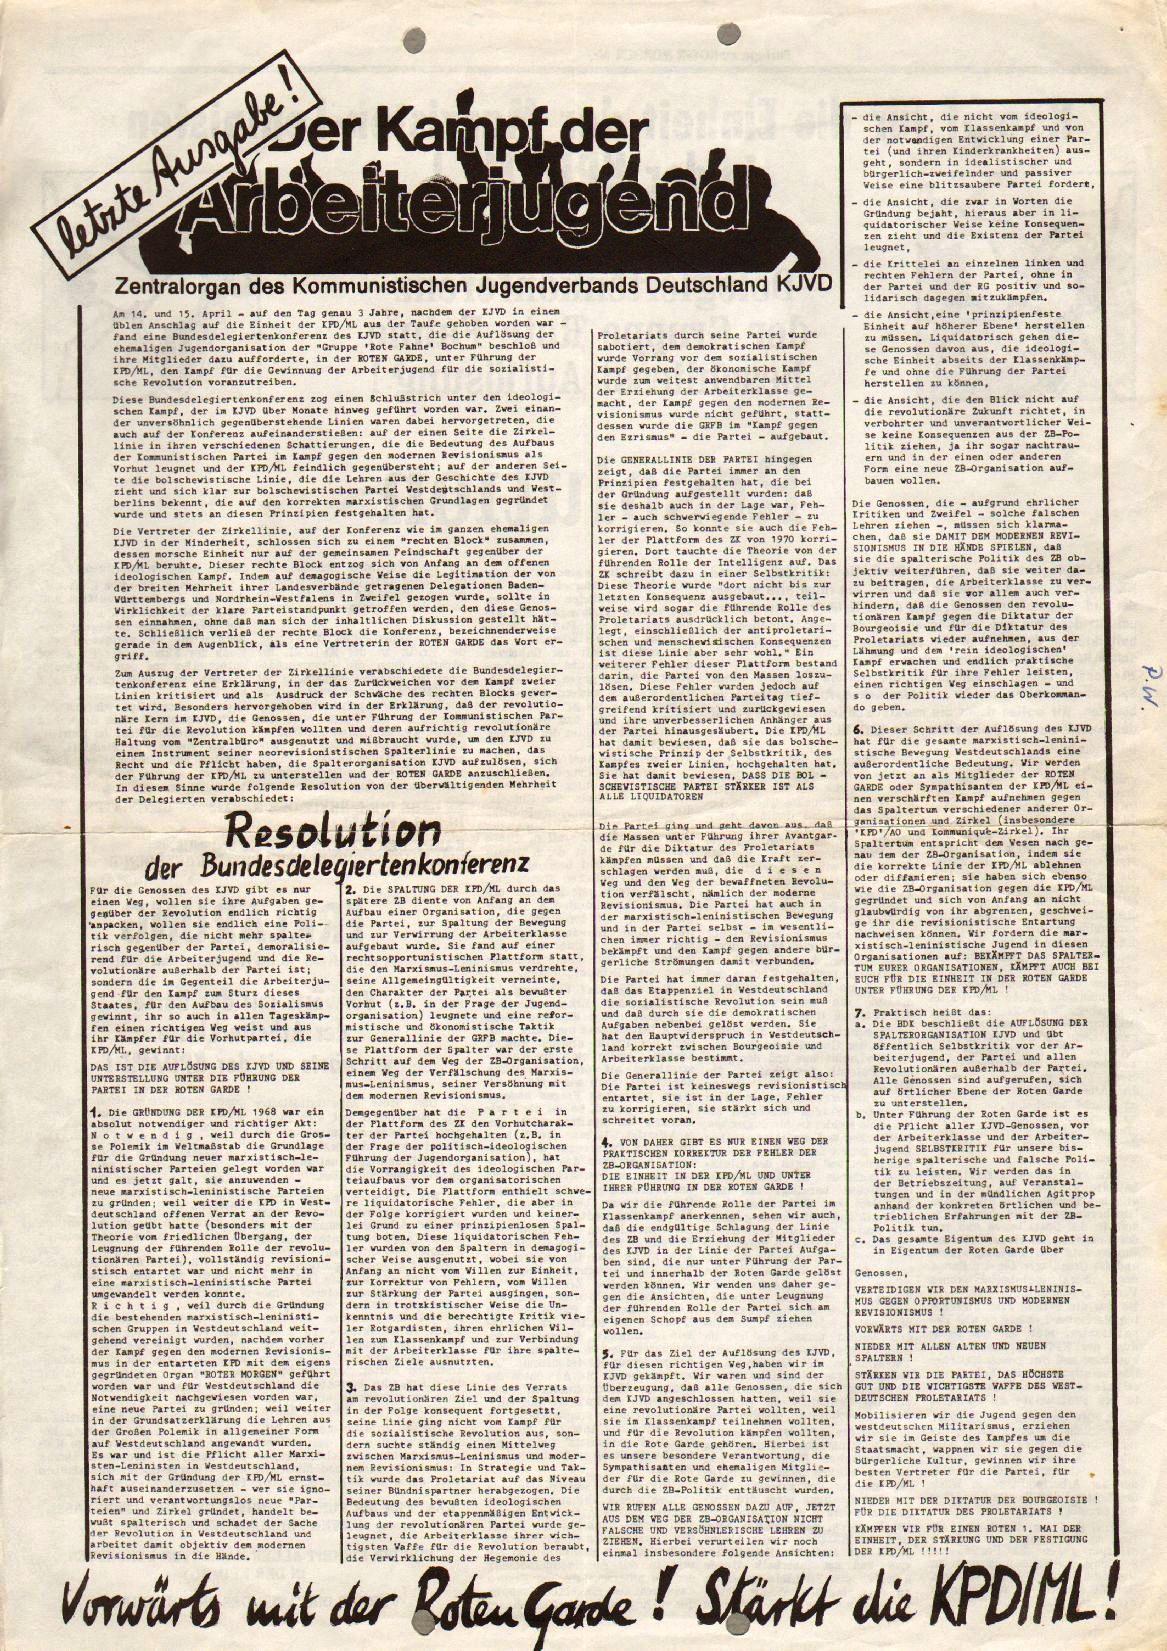 Roter Morgen, 7. Jg., 5. Mai 1973, Nr. 17, Beilage, Seite 2